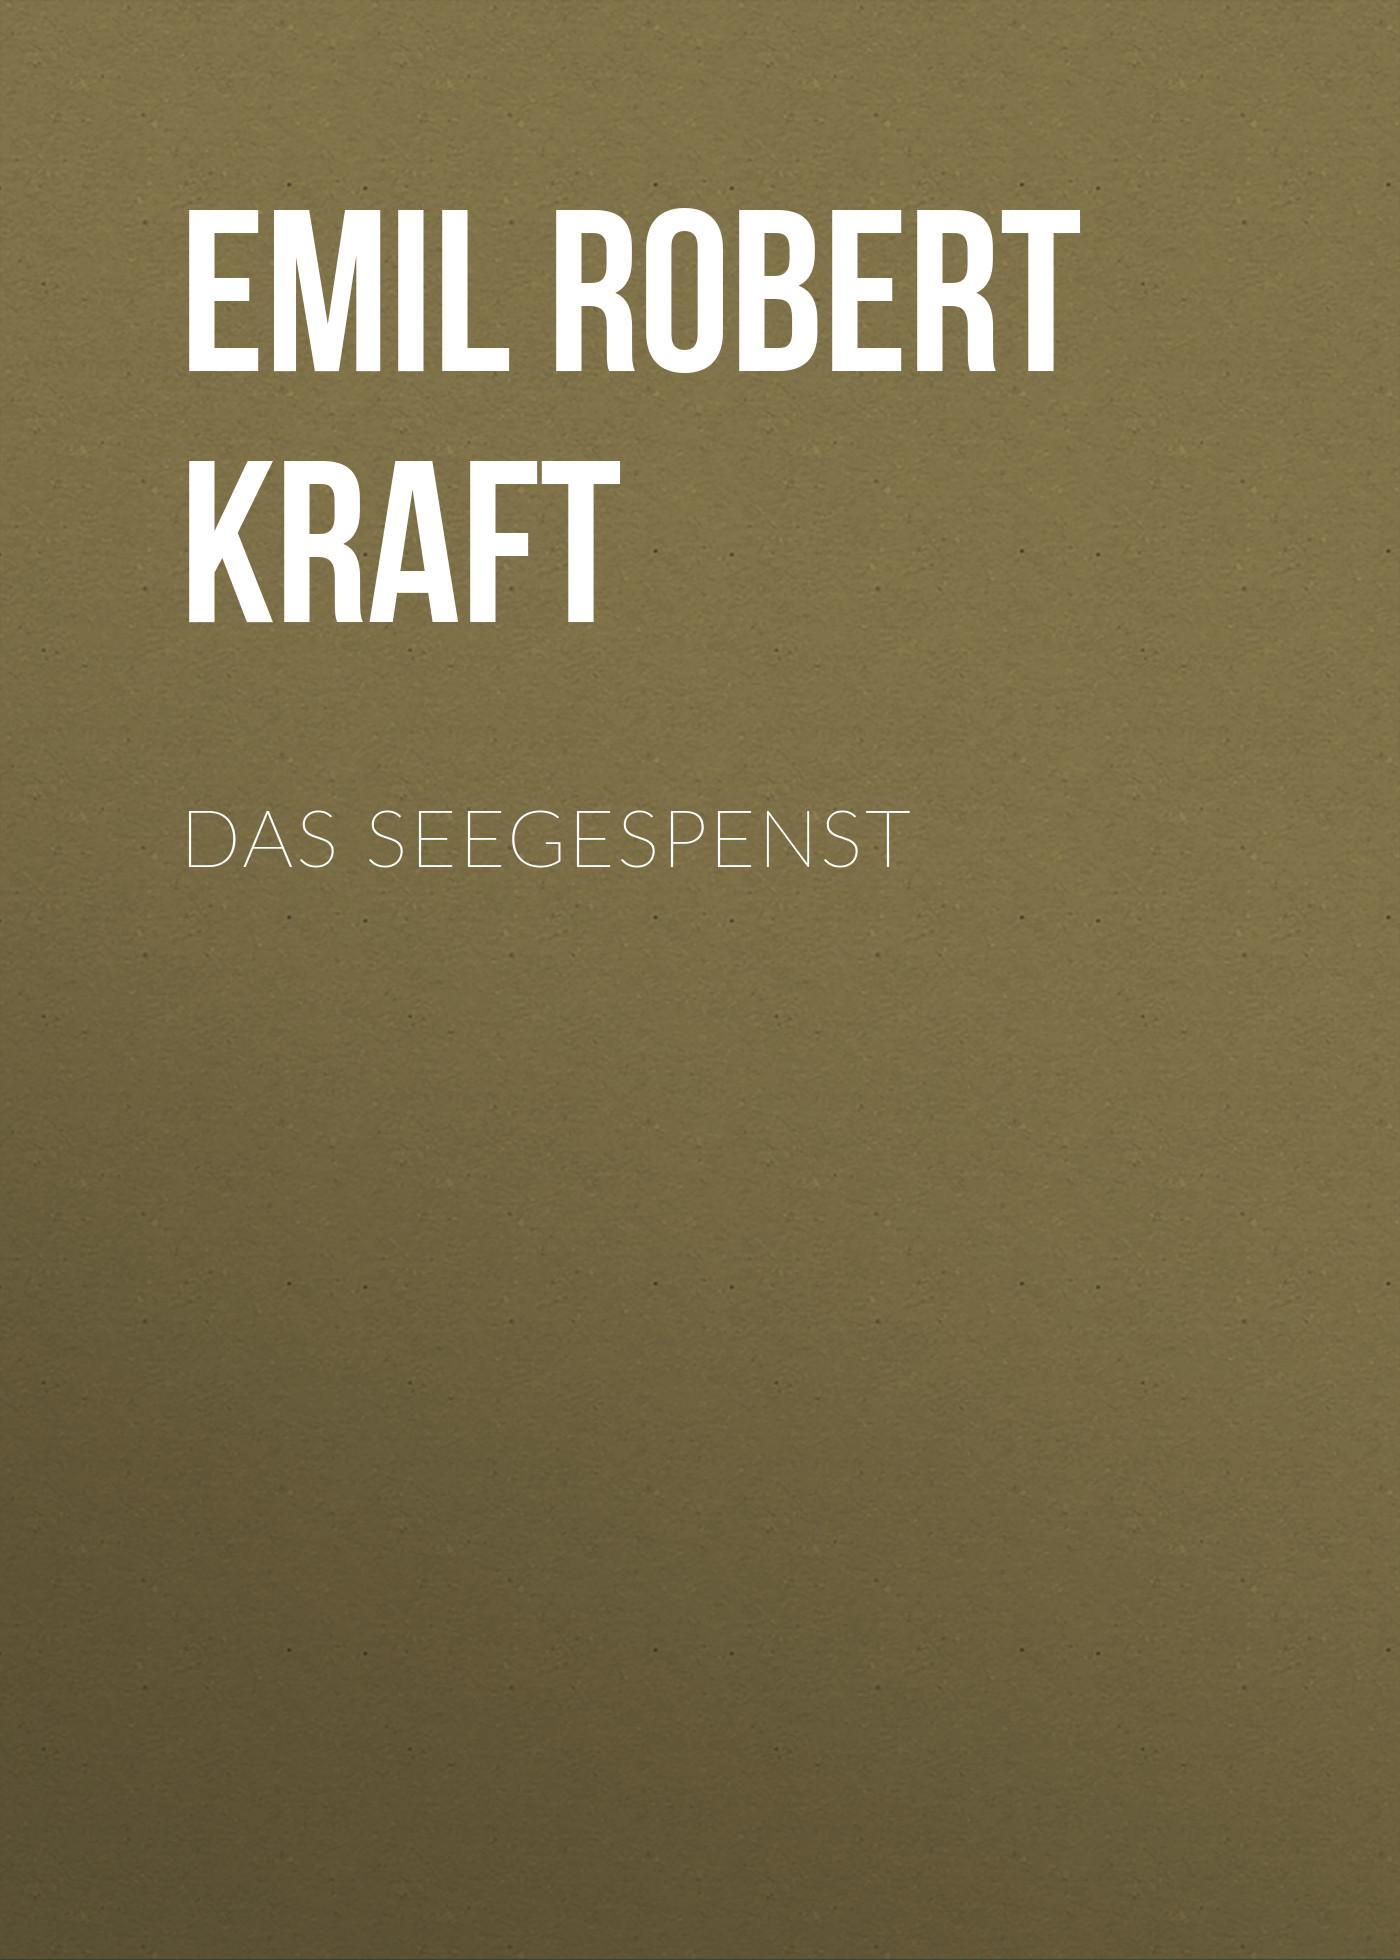 Emil Robert Kraft Das Seegespenst учусь думать для детей 3 4 лет